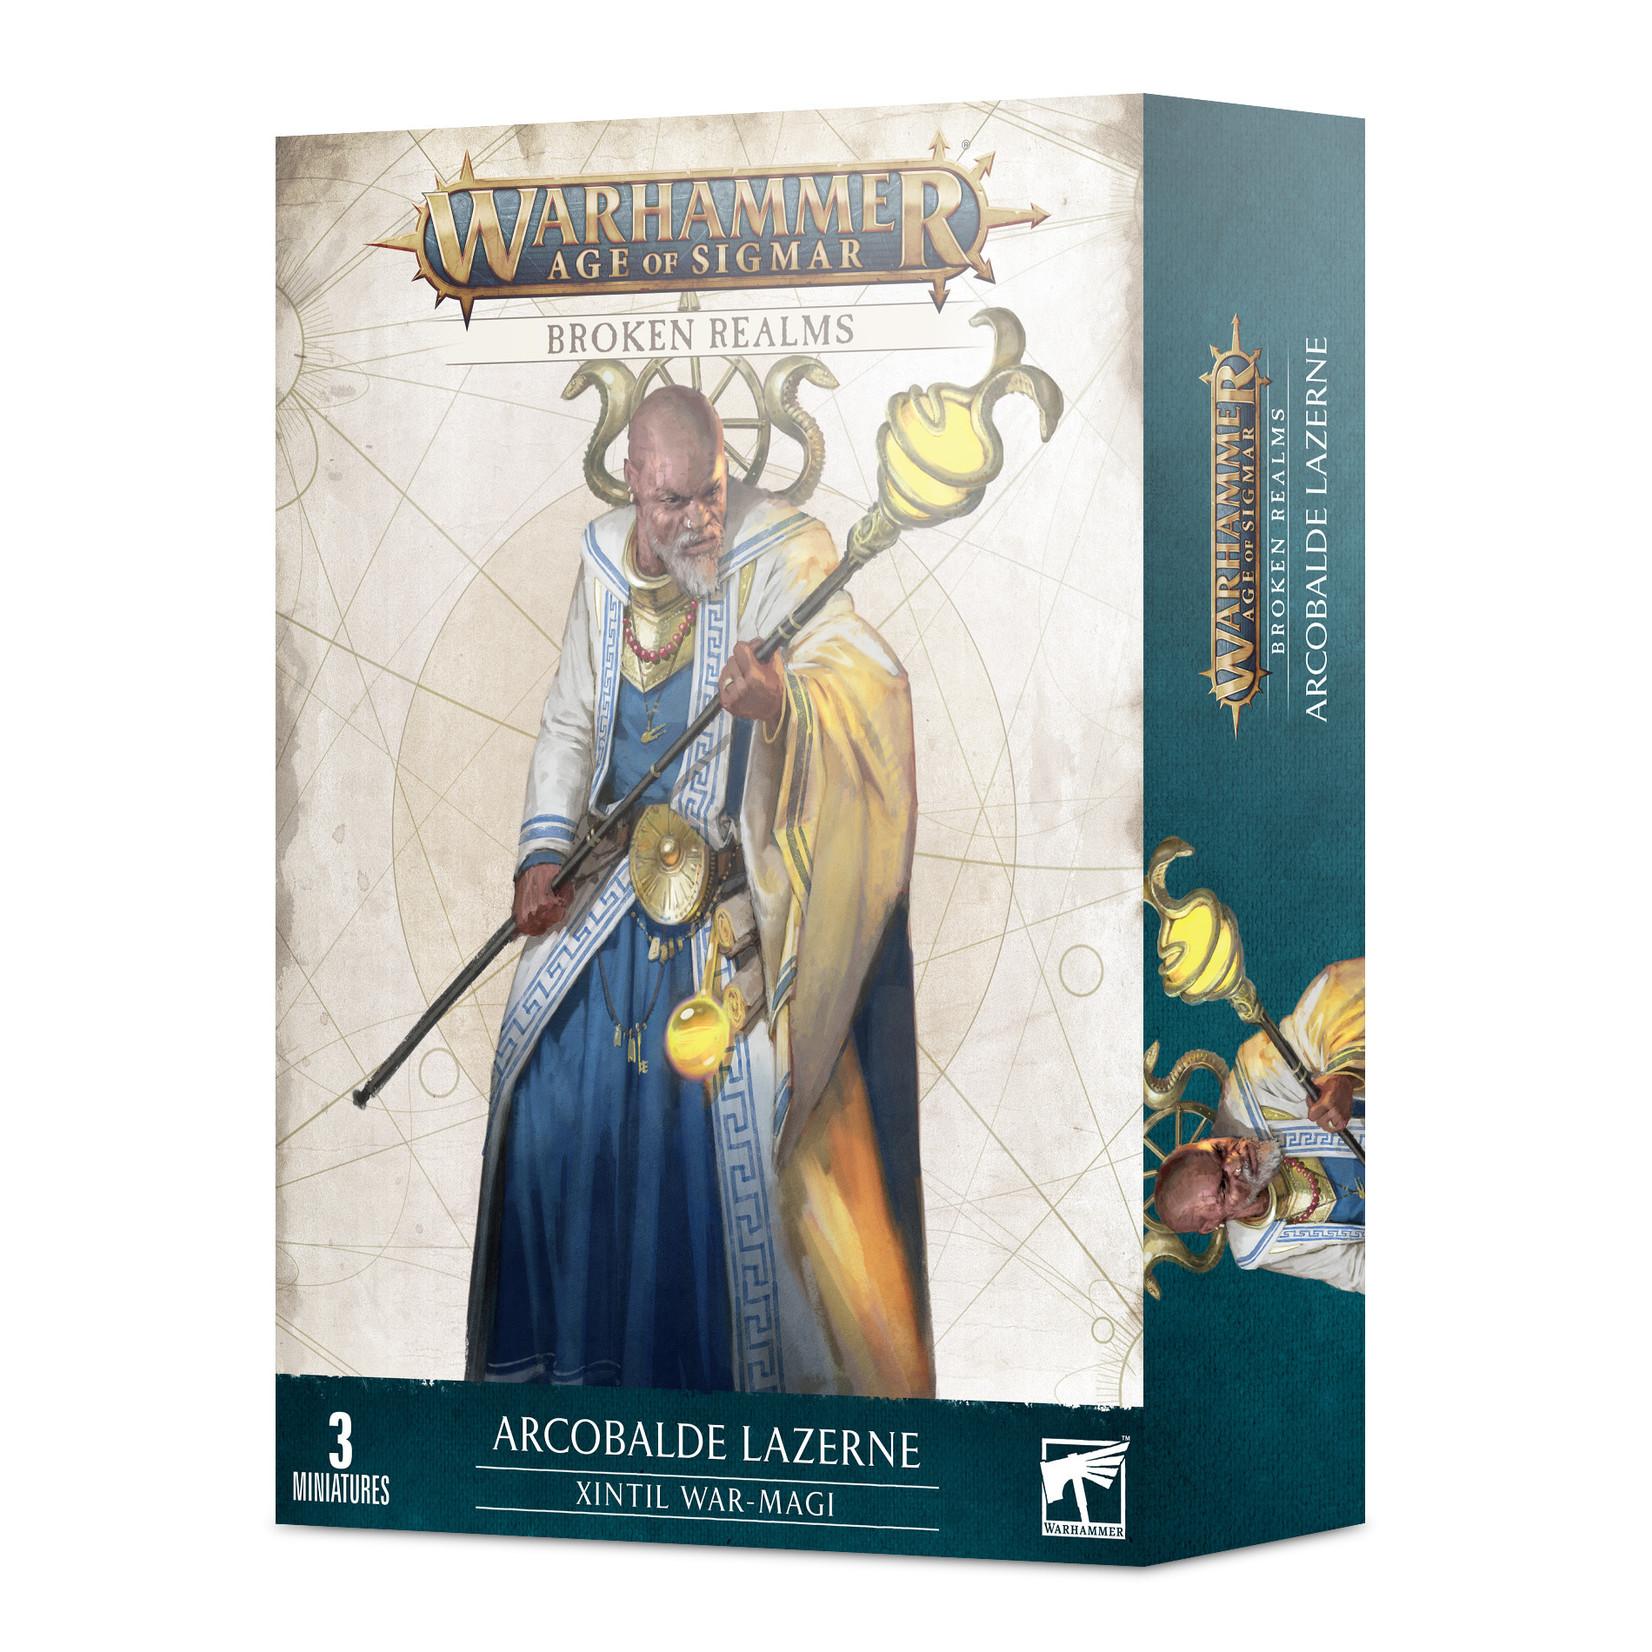 Games Workshop Warhammer Age of Sigmar: Broken Realms - Xintil War-magi